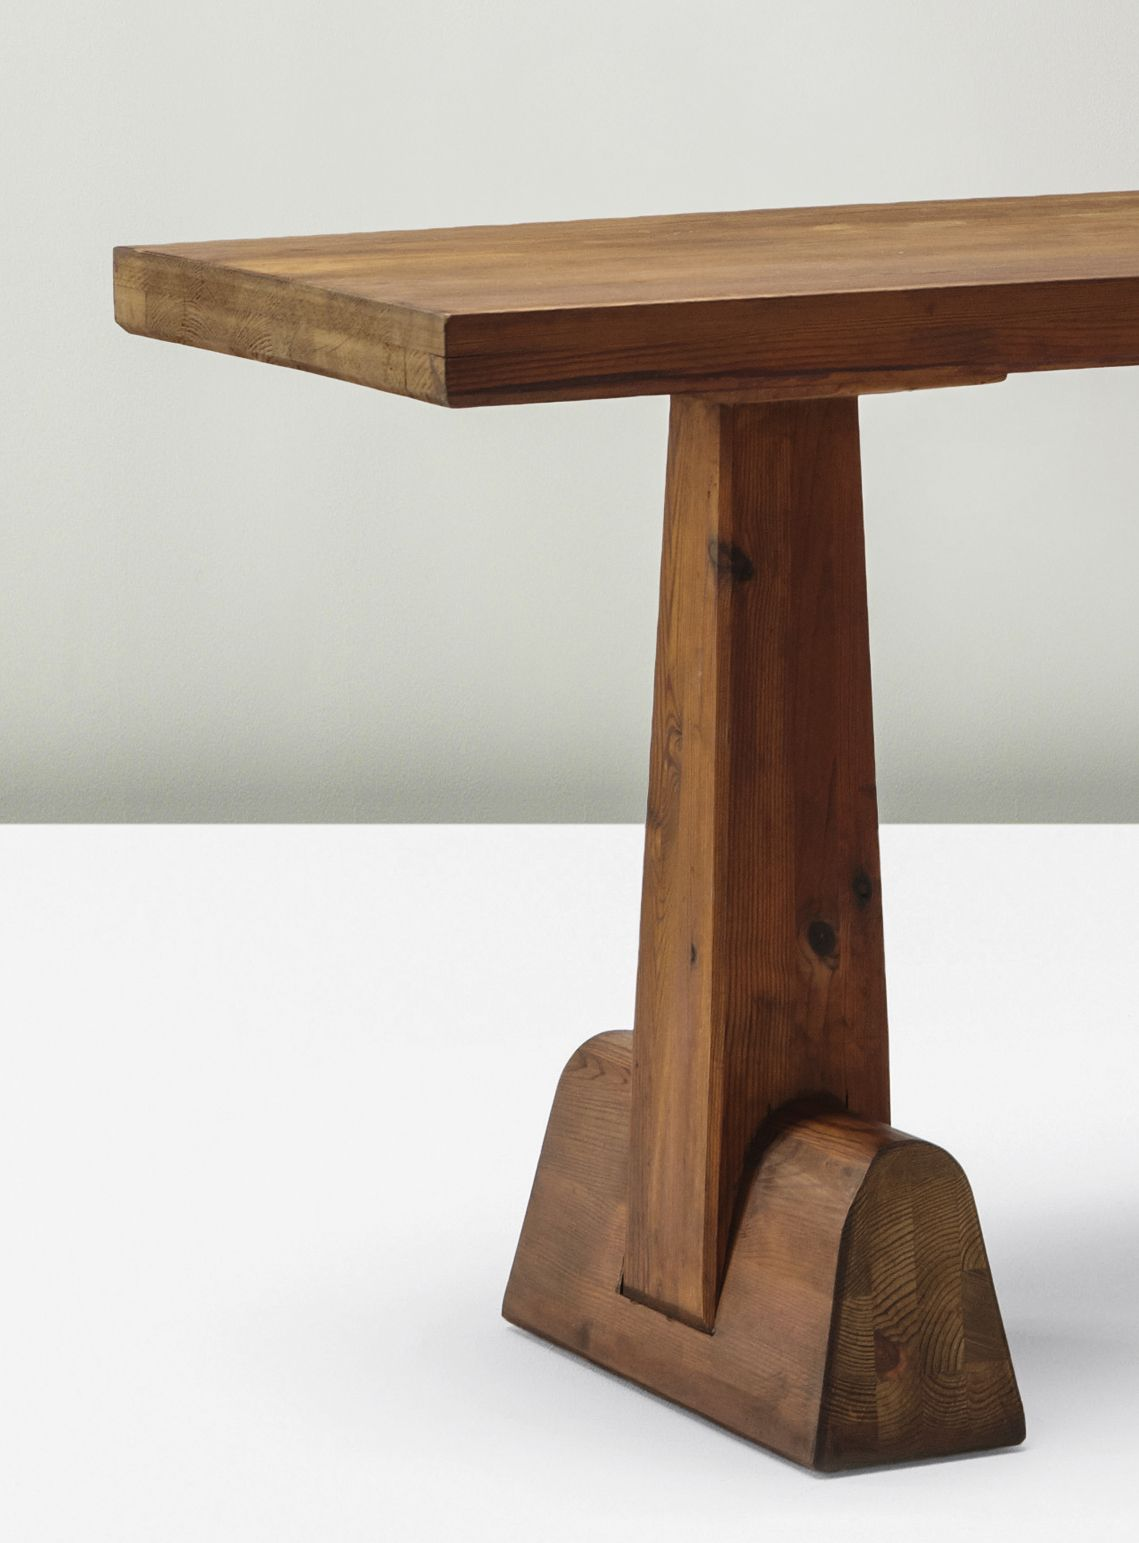 Axel Einar Hjorth, Utö dining table, circa 1932. Material pine ...